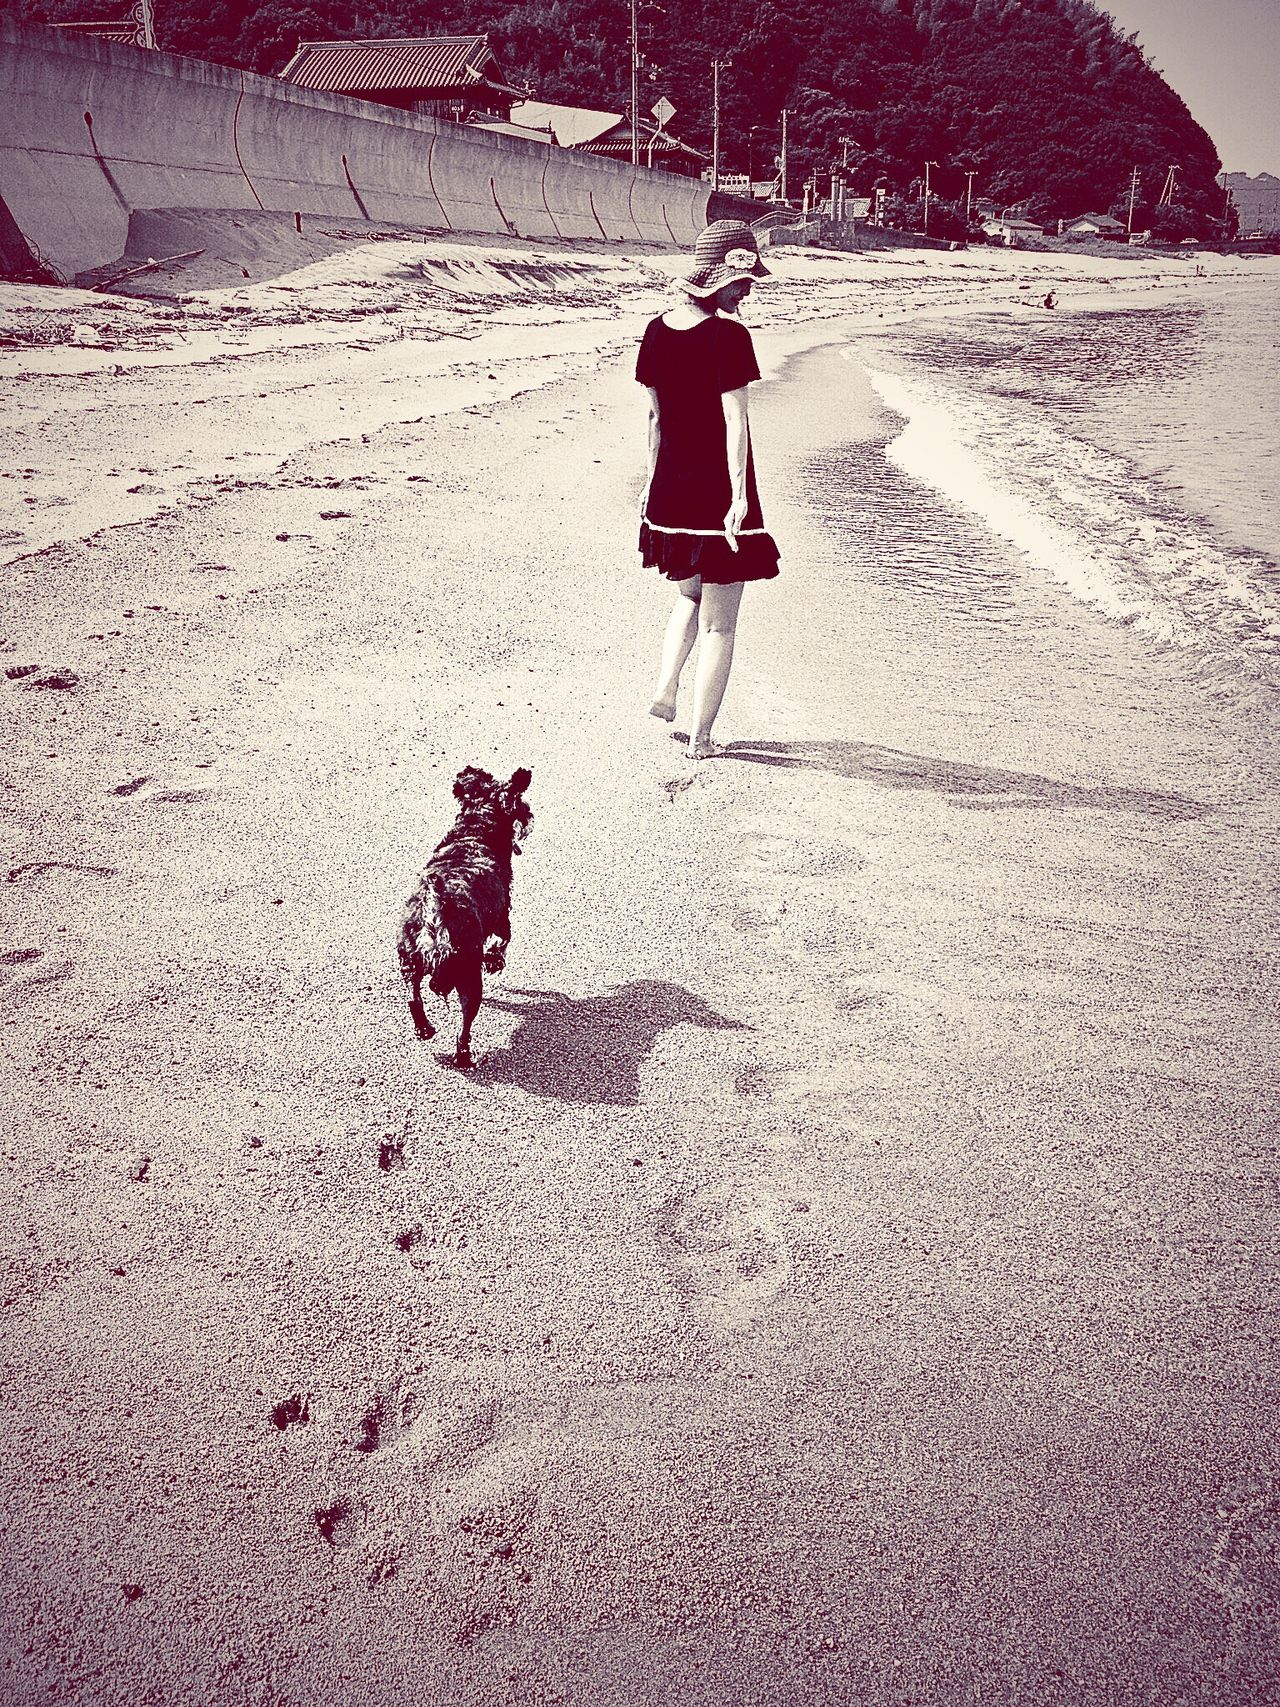 Awajishima Ocean Sea Dog Wife Family Blackandwhite Black And White Photography Blackandwhite Photography Black & White Black And White Nature People Together